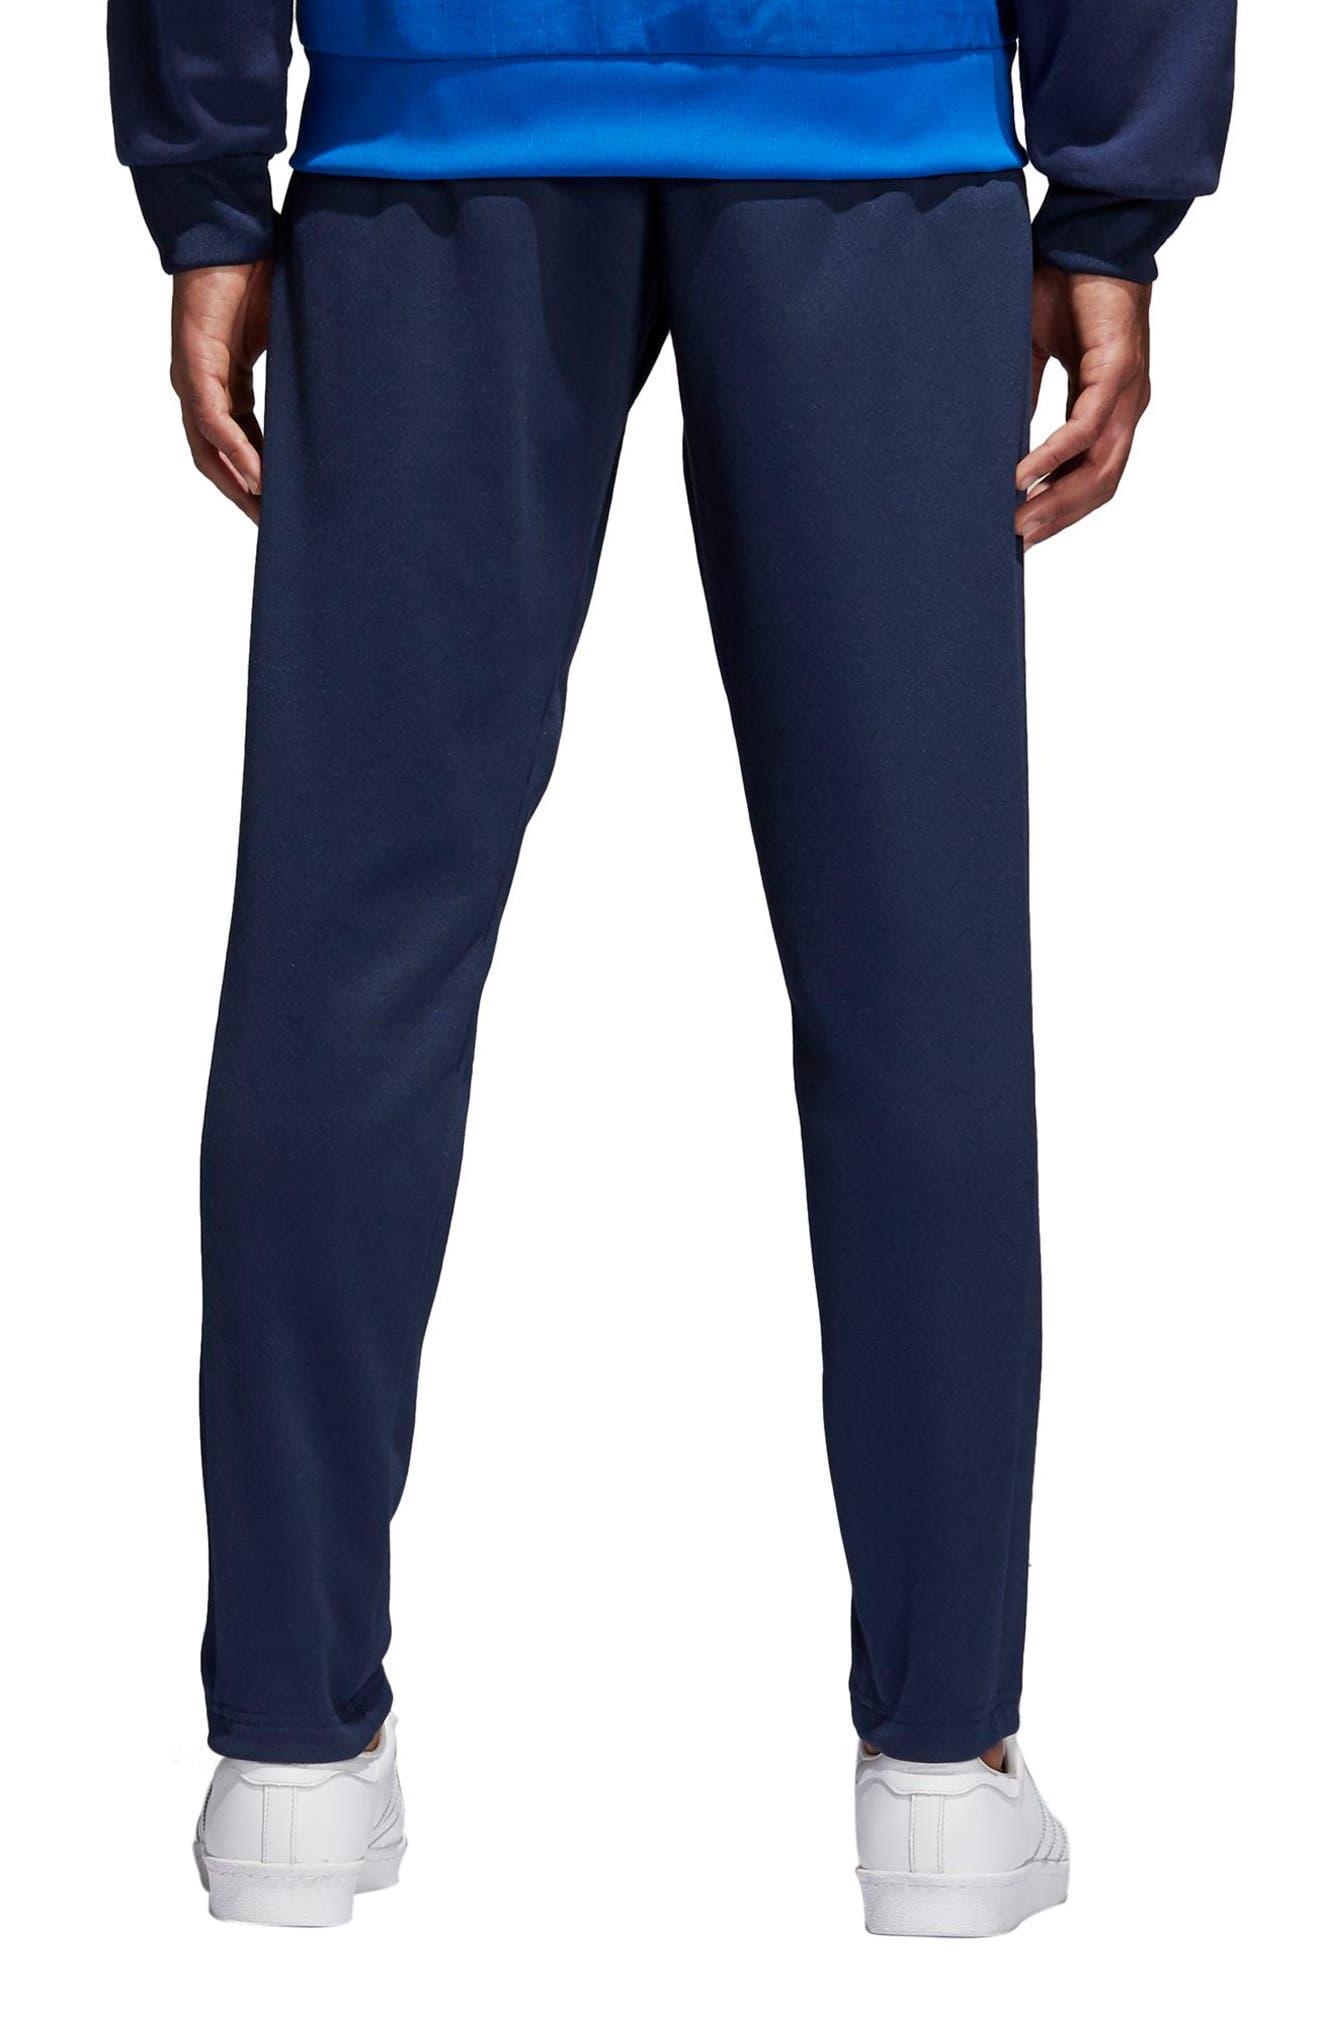 Originals Training Pants,                             Alternate thumbnail 2, color,                             Collegiate Navy